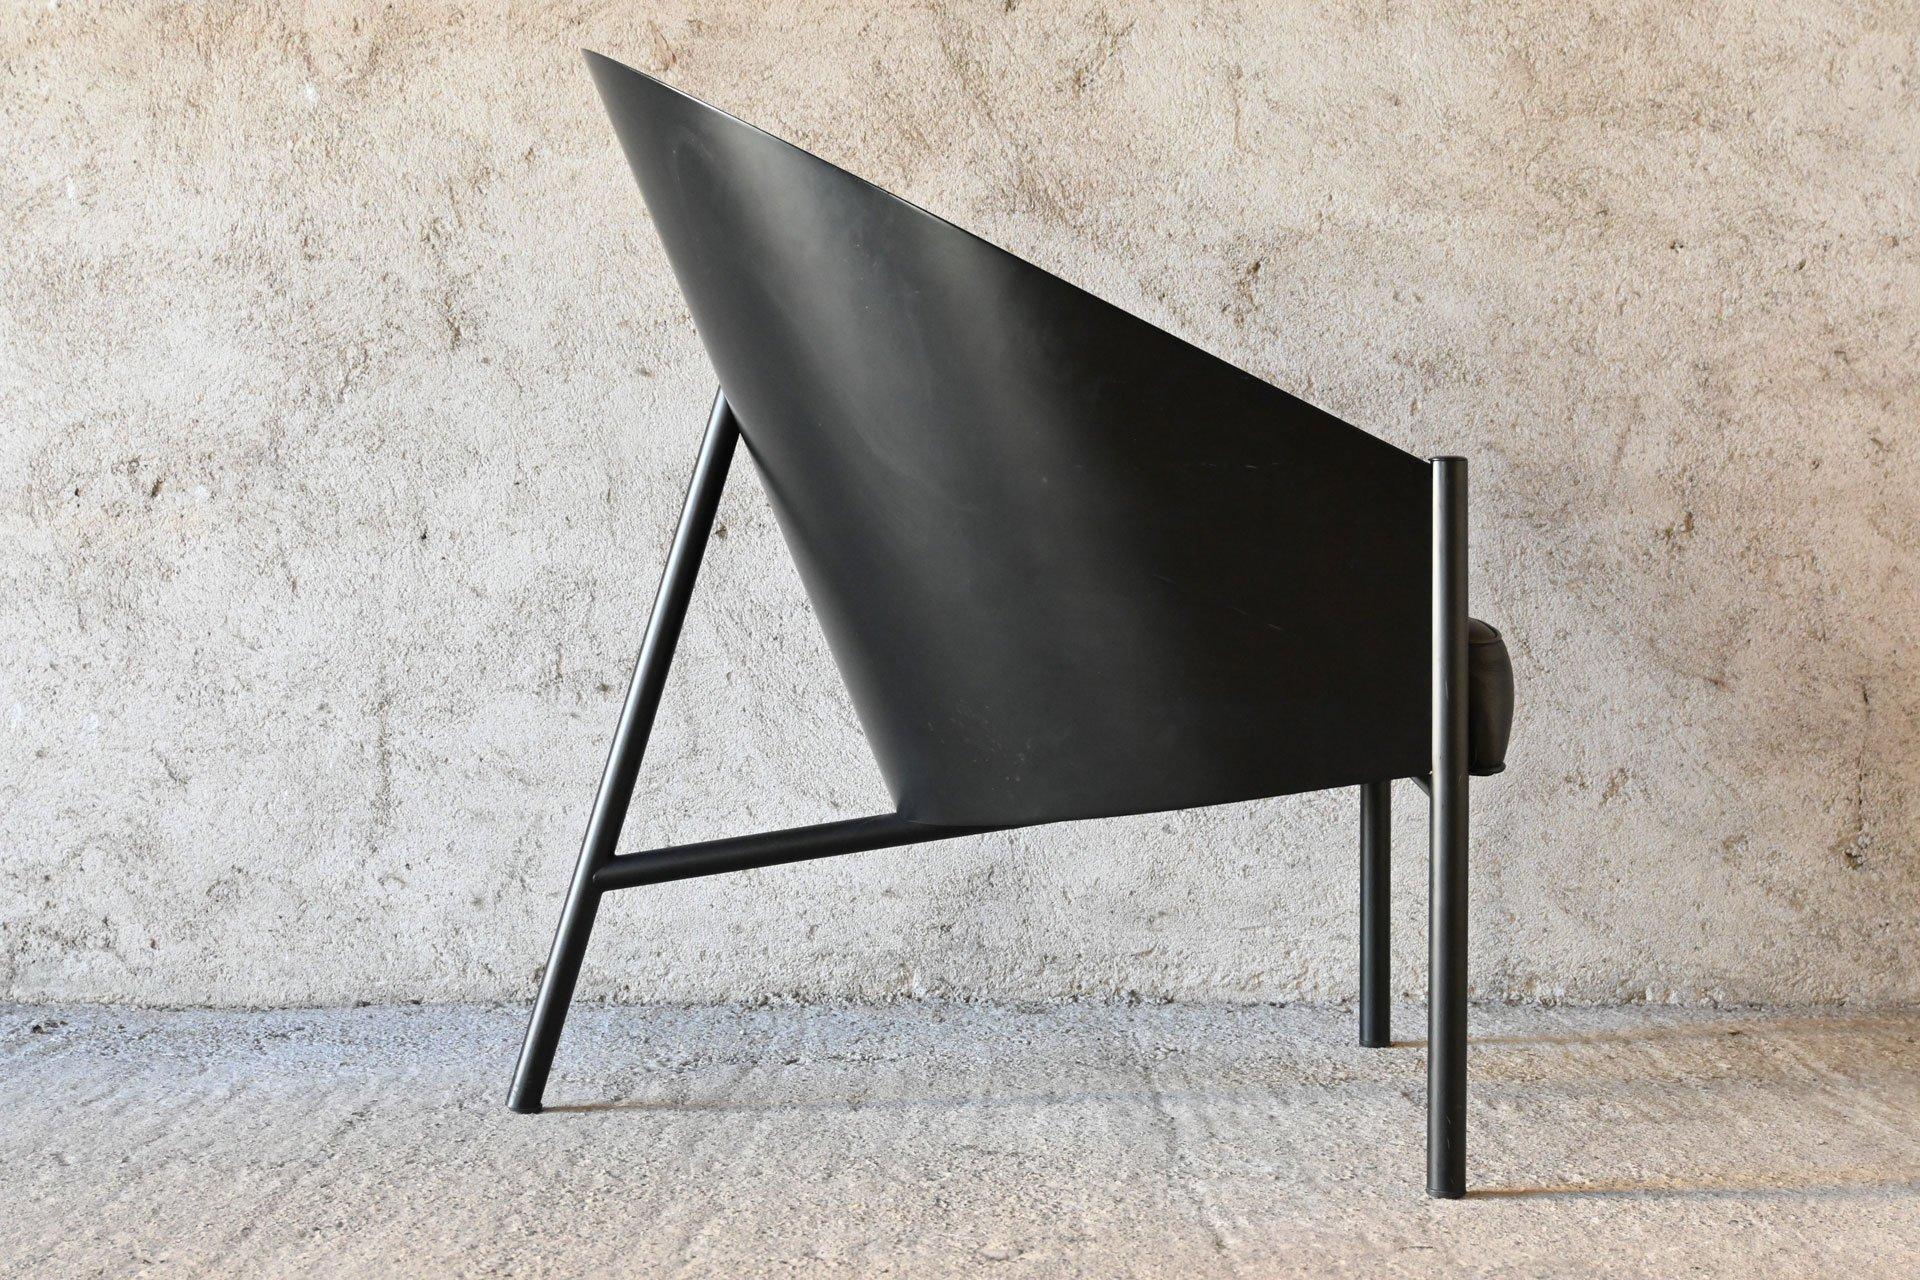 Driade Aleph Philippe Starck Pratfall 1982